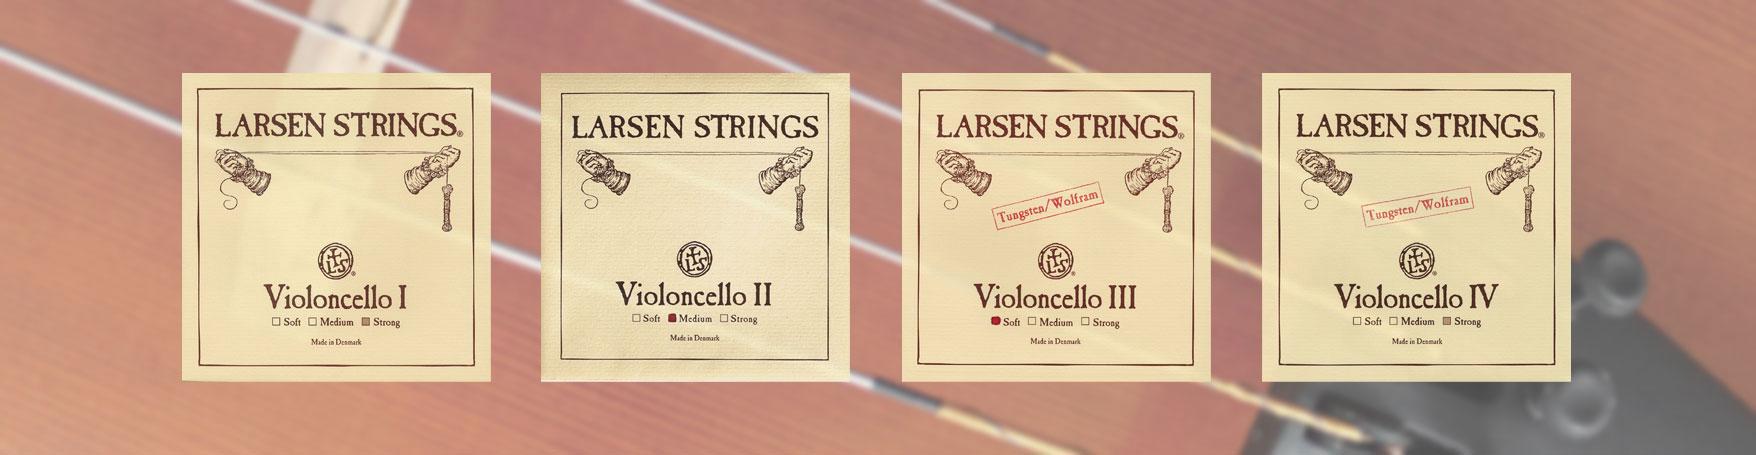 Larsen Original Cello Strings